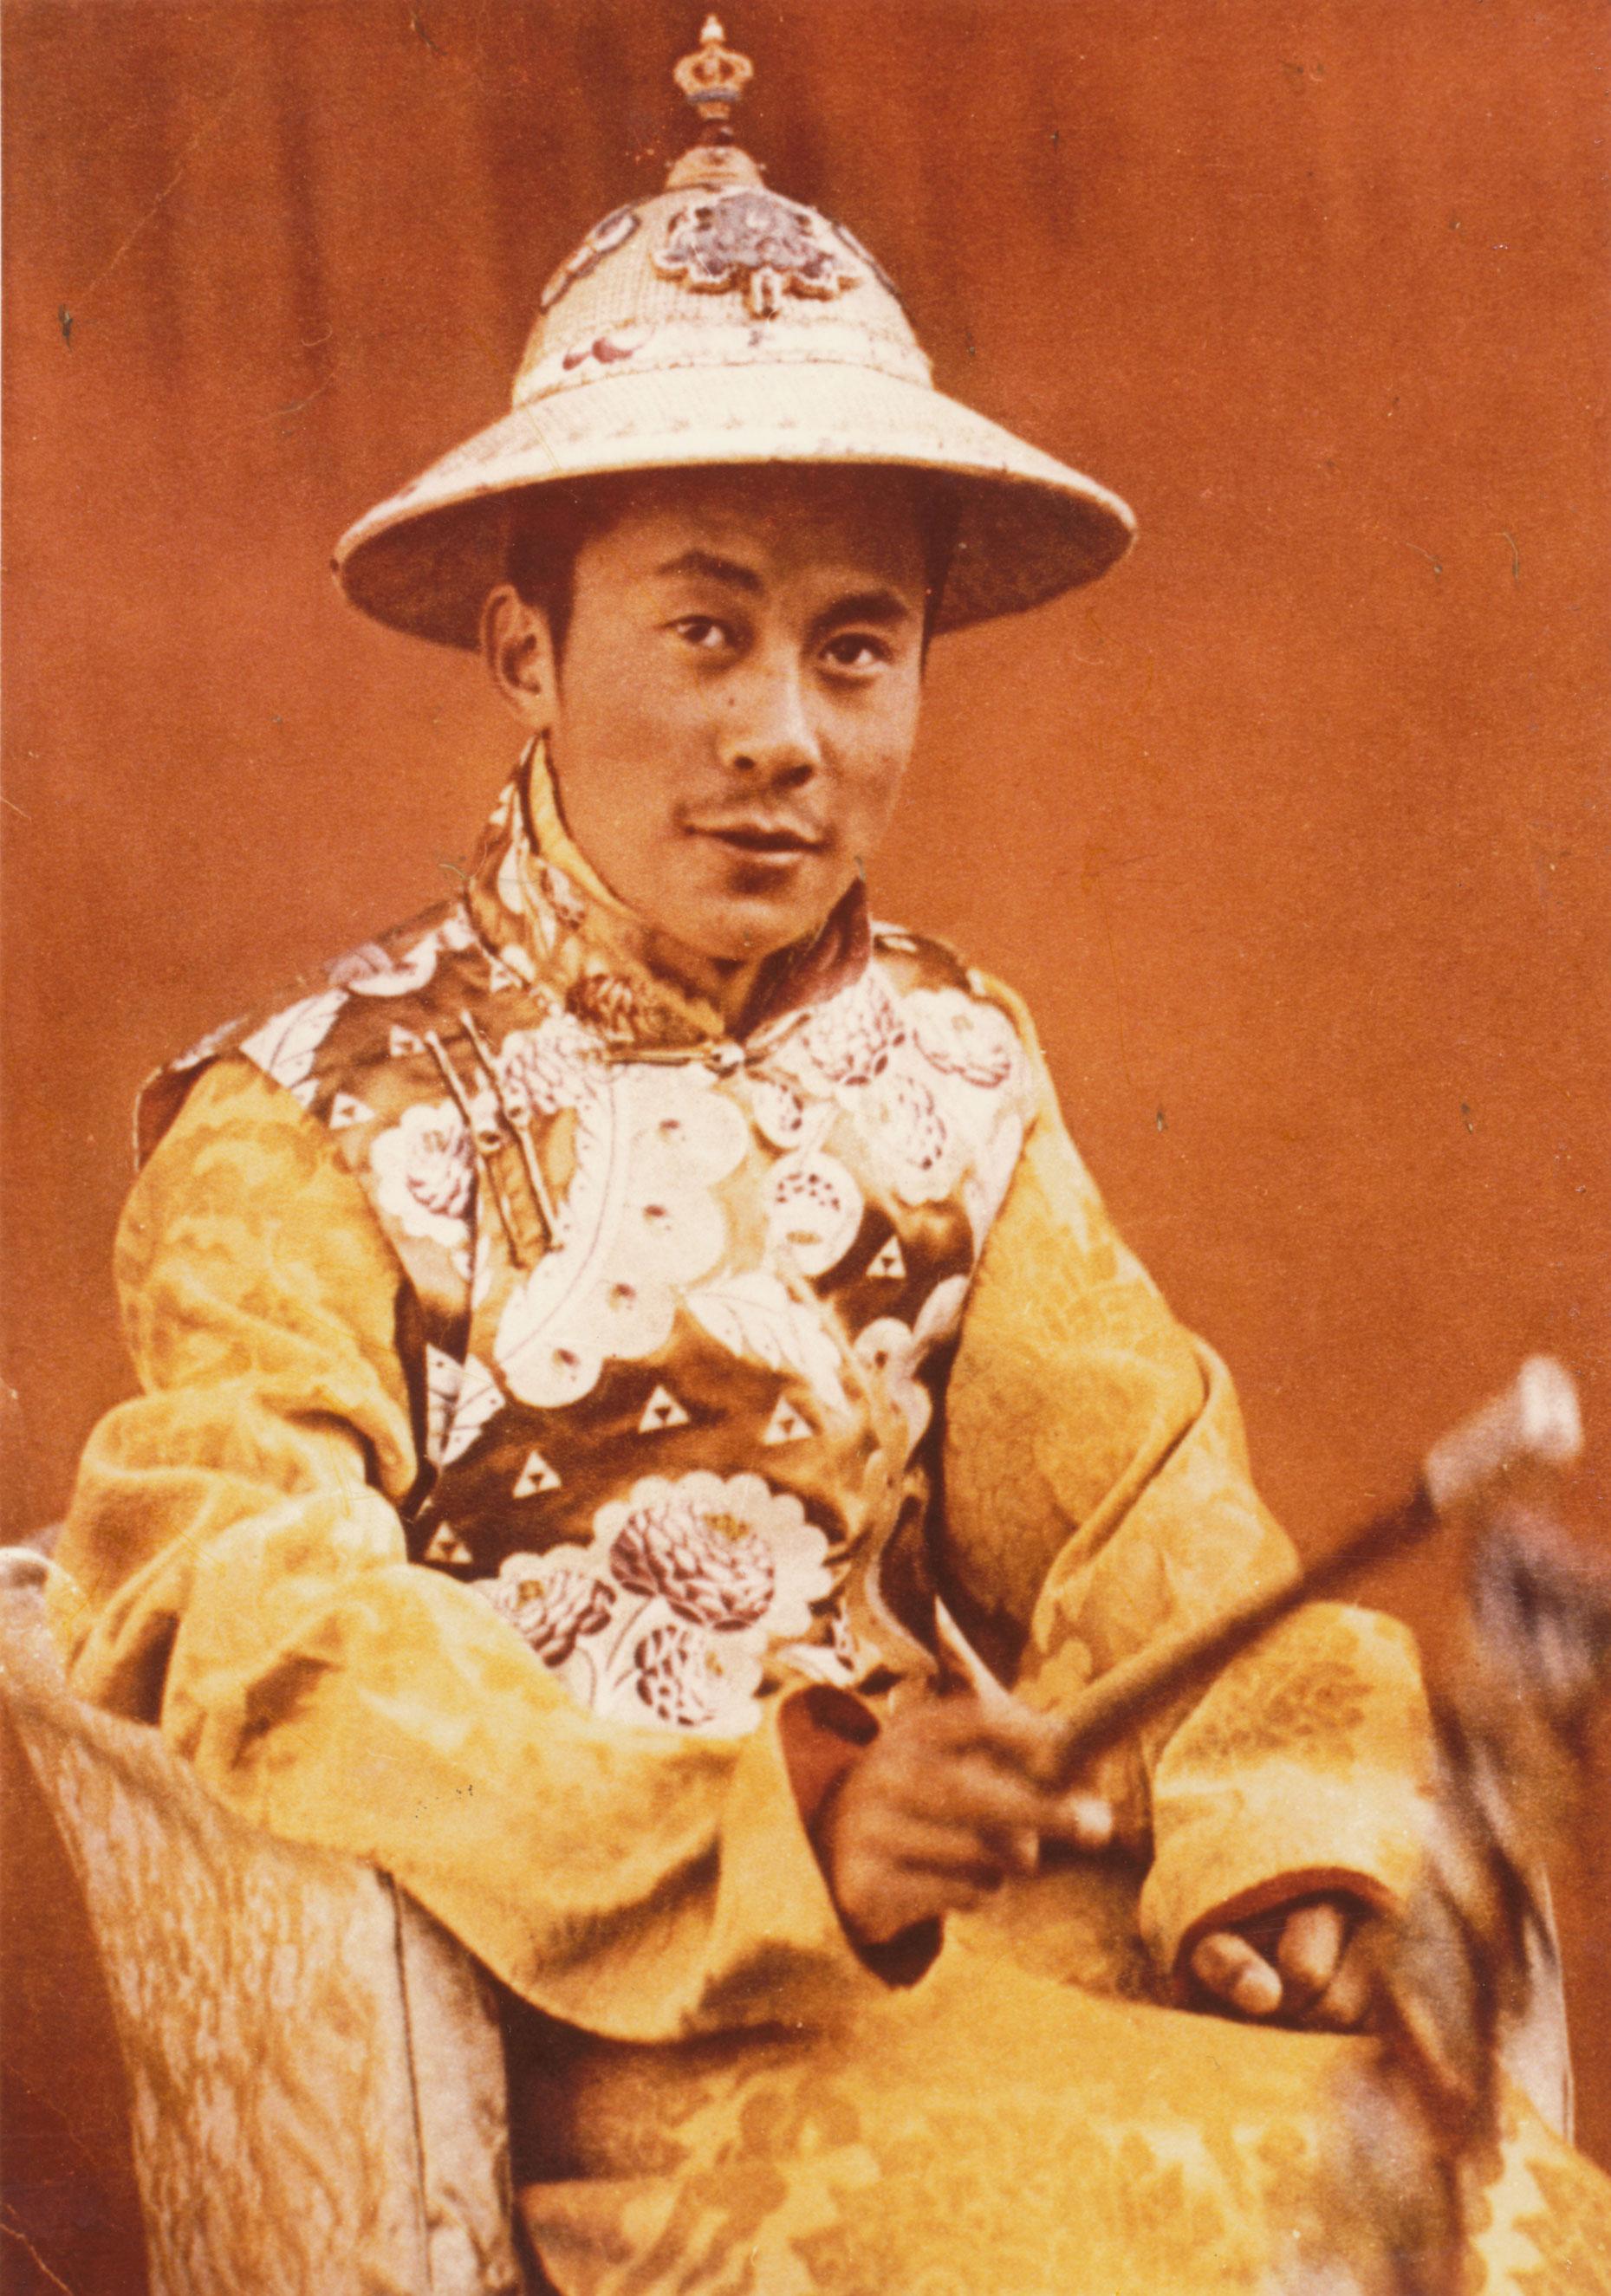 His Holiness wearing a ceremonial Tibetan chuba.